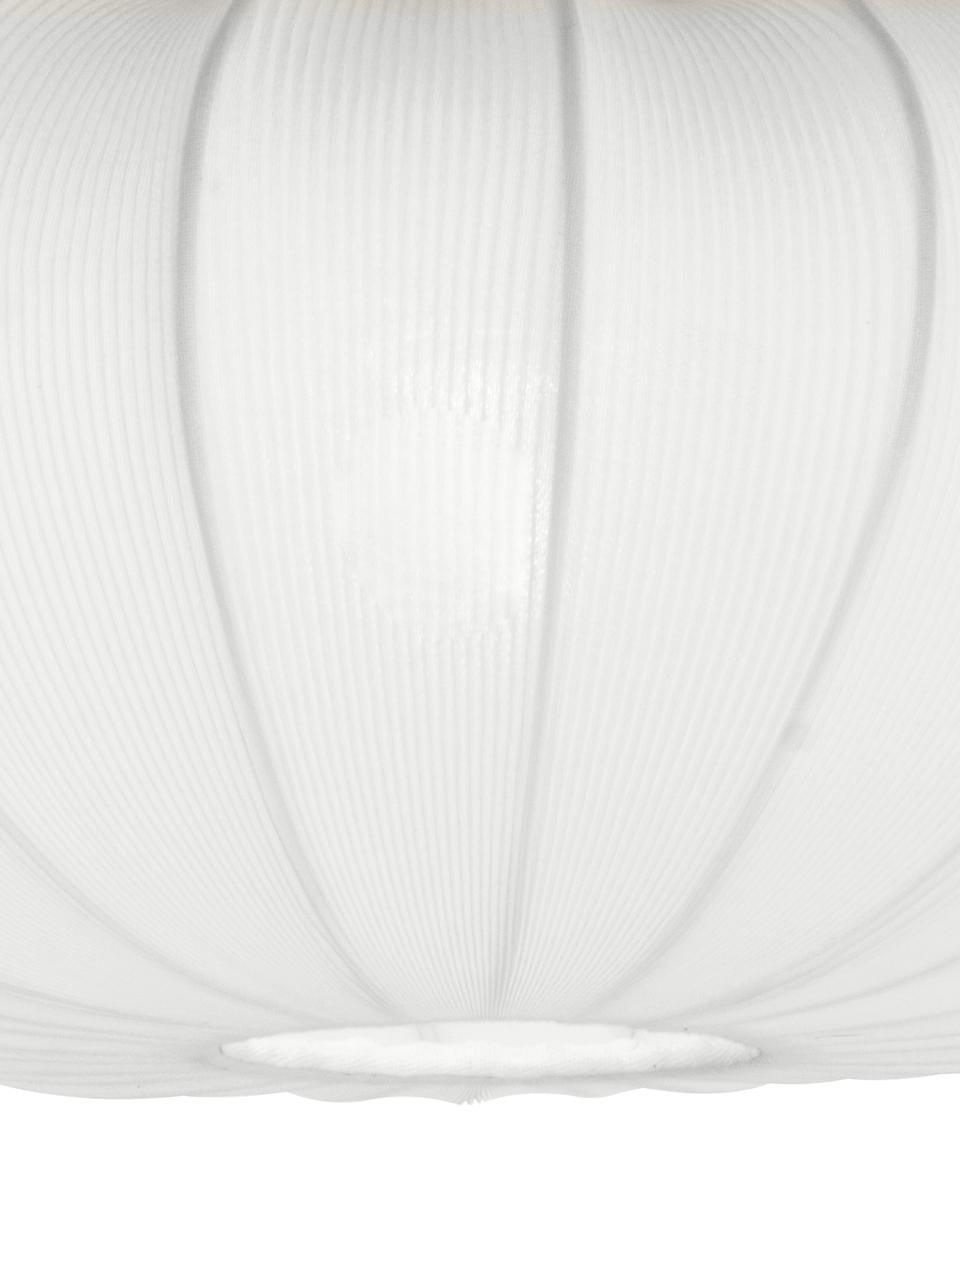 Plafoniera Mamsell, Paralume: 60%poliestere, 40%rayon, Struttura: metallo, Bianco, Ø 55 x Alt. 28 cm